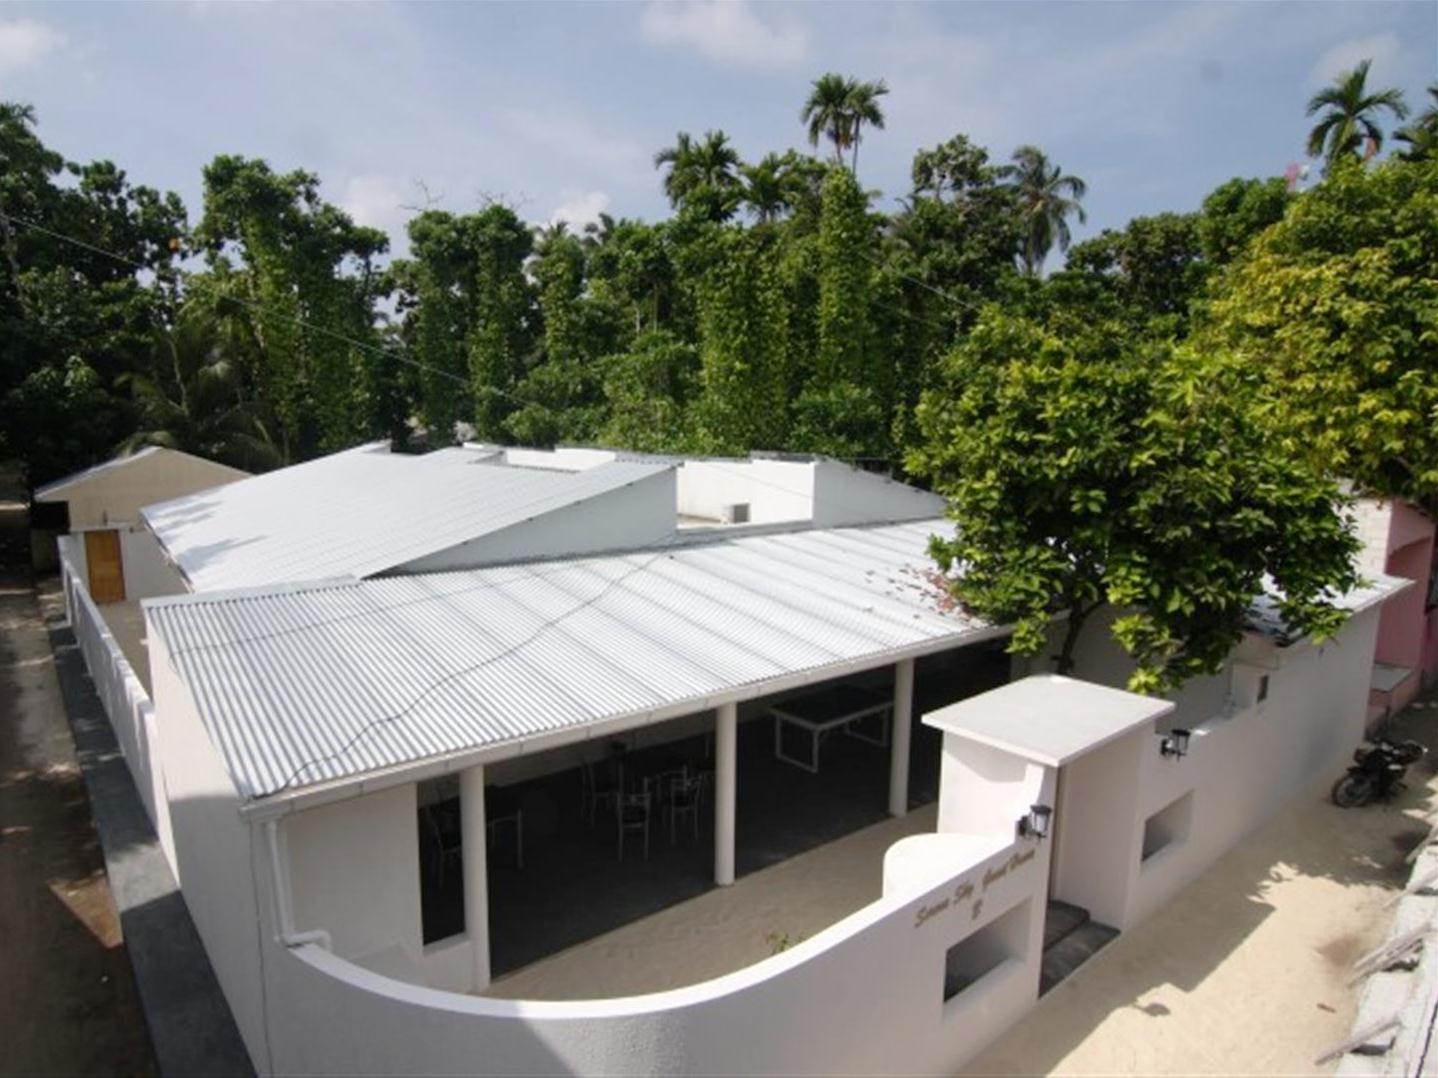 Serene Sky Guesthouse